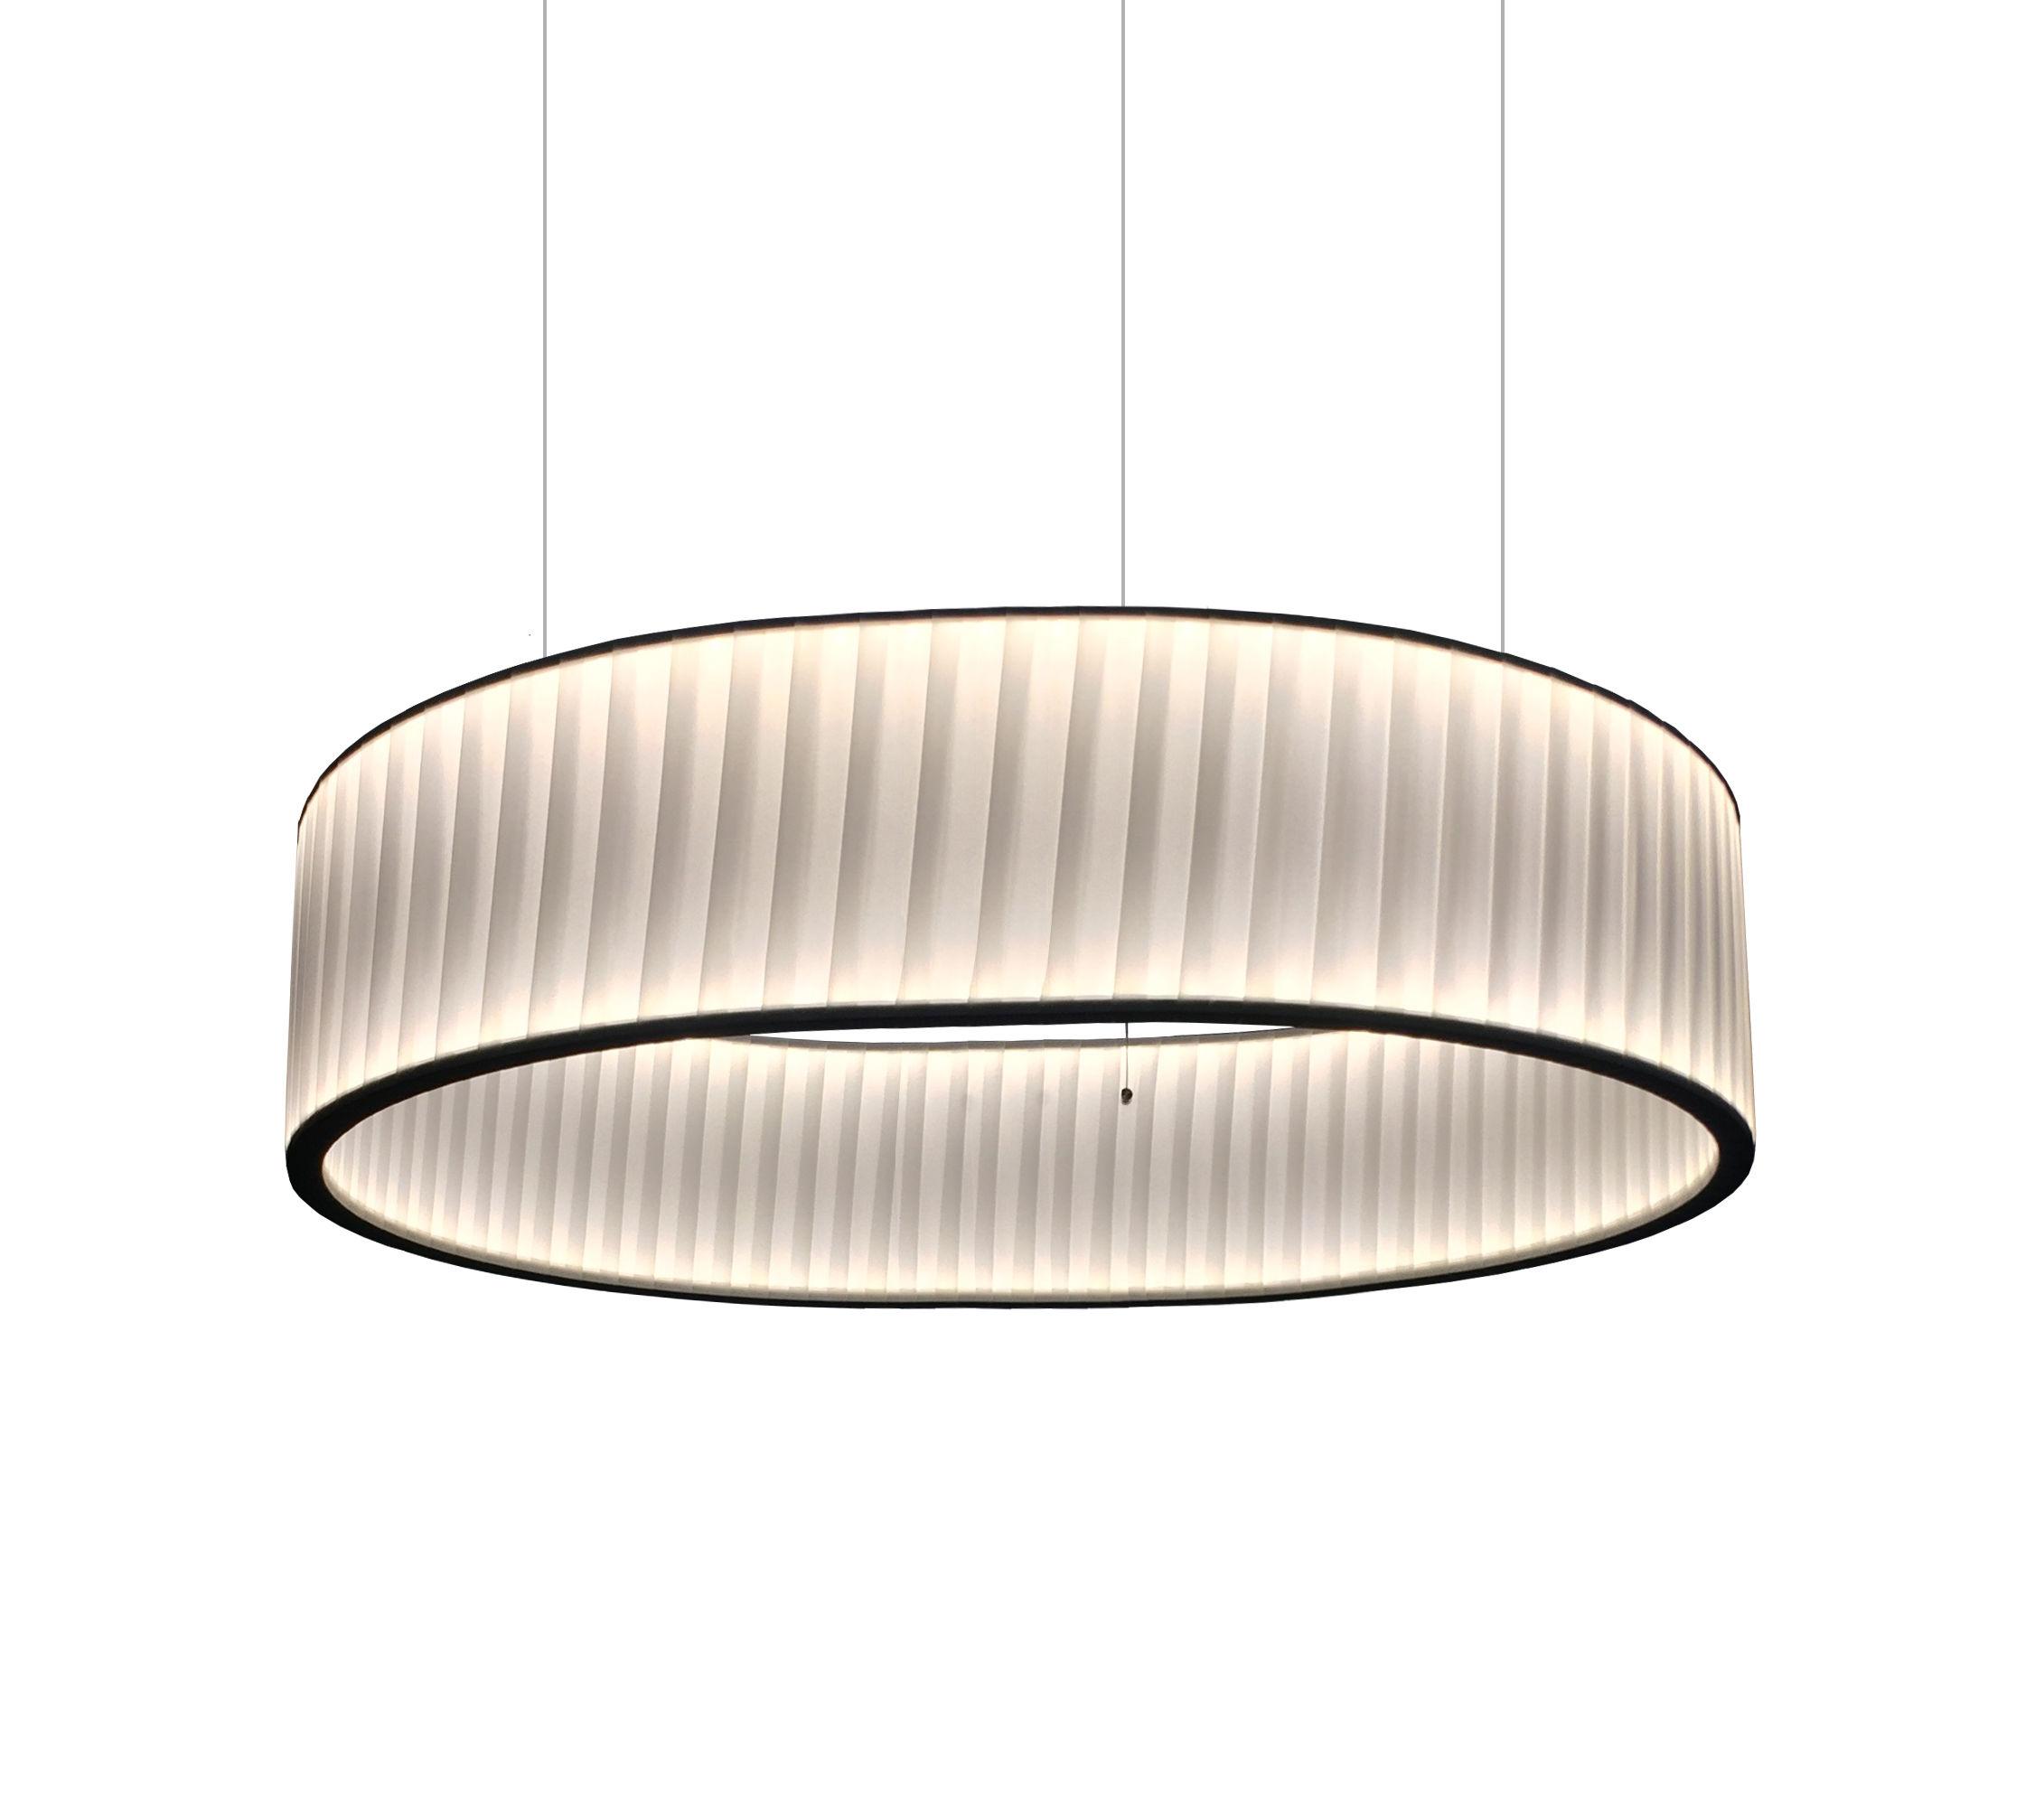 Illuminazione - Lampadari - Sospensione Ronde - / LED doppio flusso - Ø 80 cm di Dix Heures Dix - Bianco - Inox, Tessuto